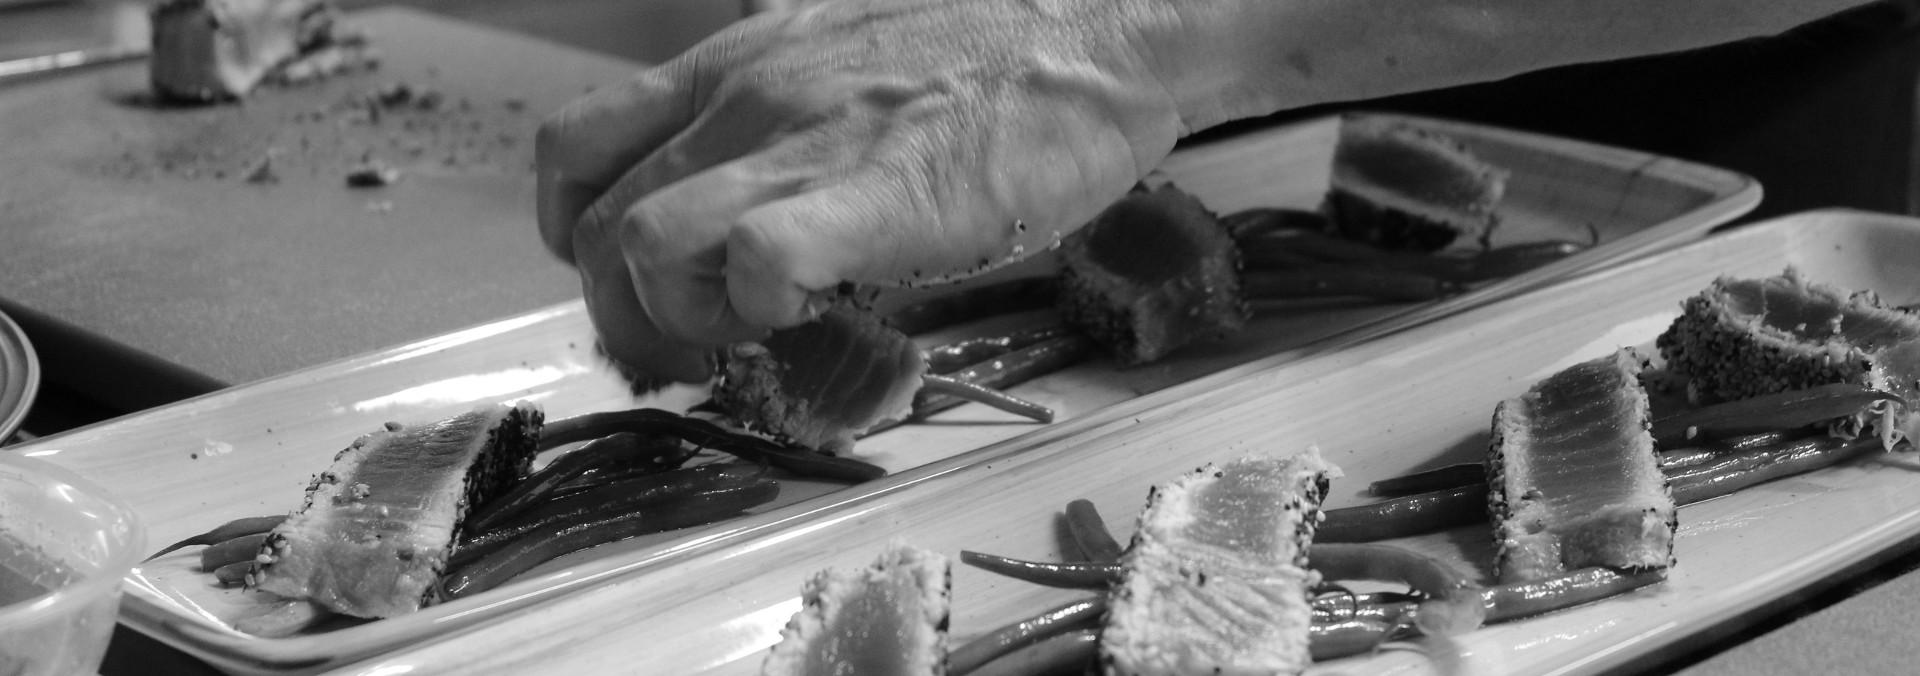 osteria-pesce-fresco-alghero-wh